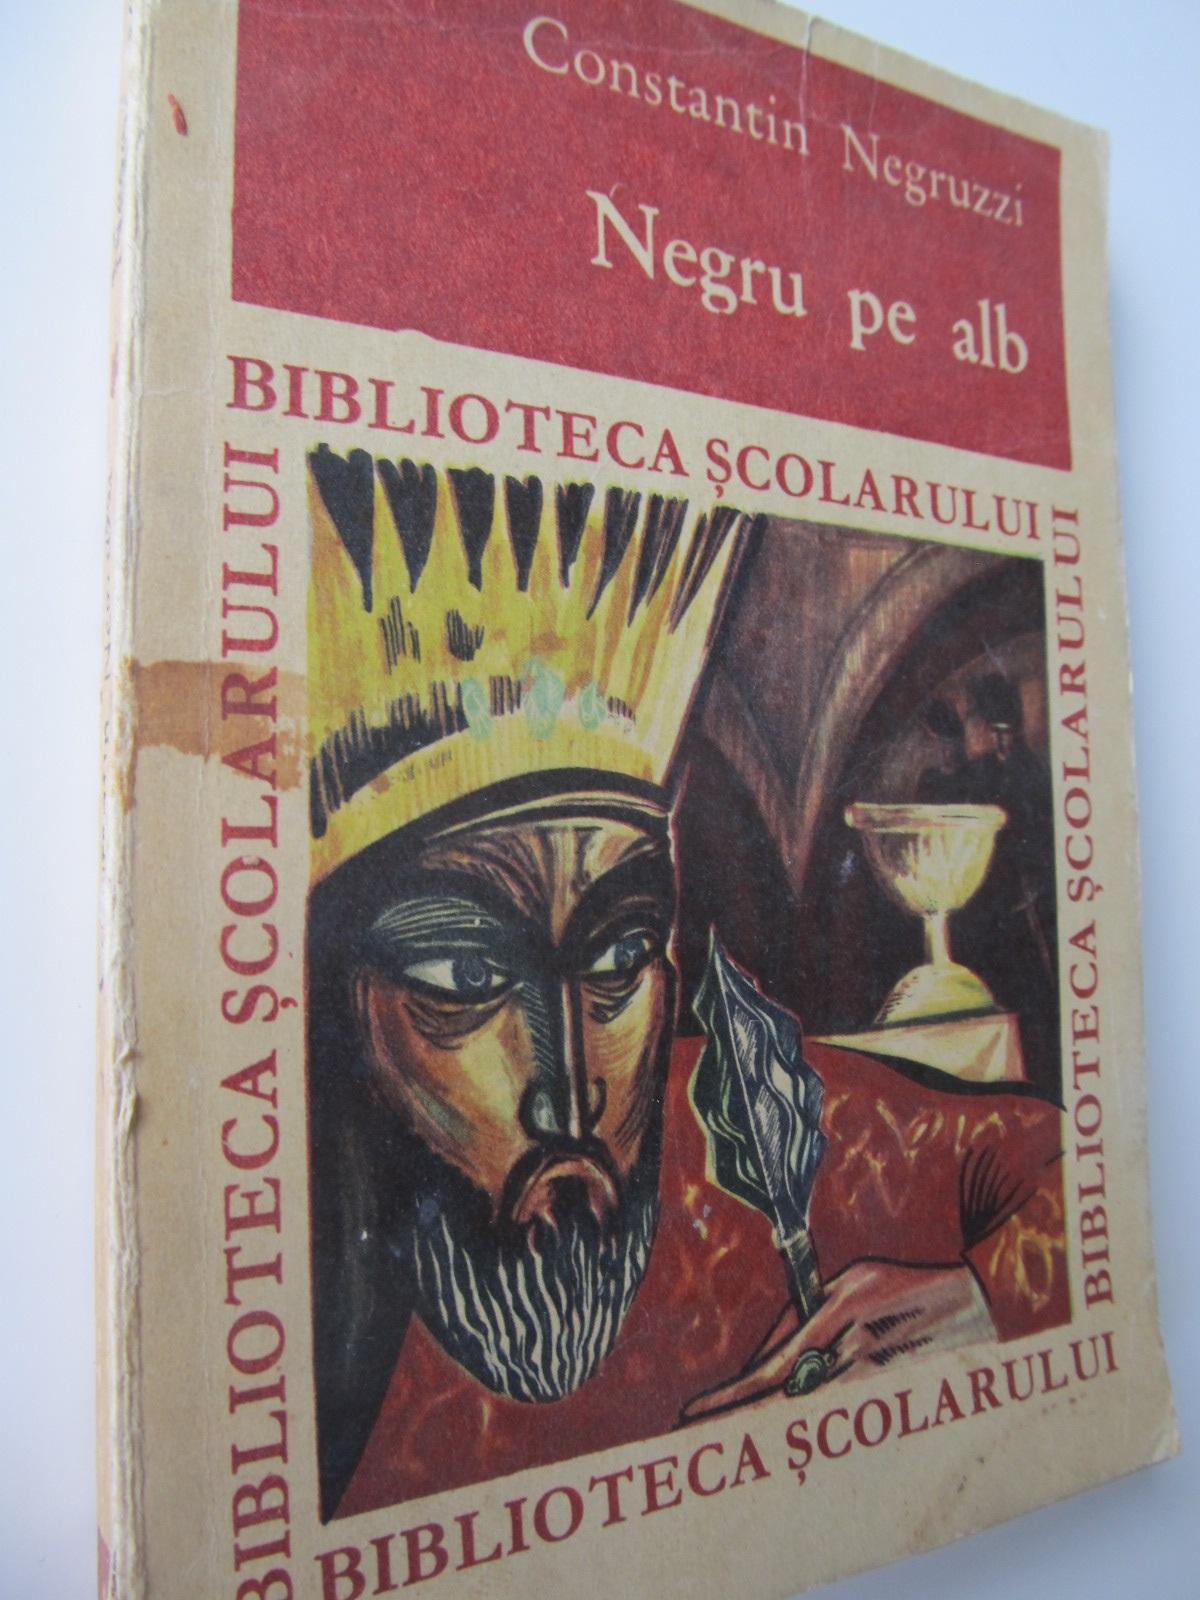 Negru pe alb - Constantin Negruzzi | Detalii carte